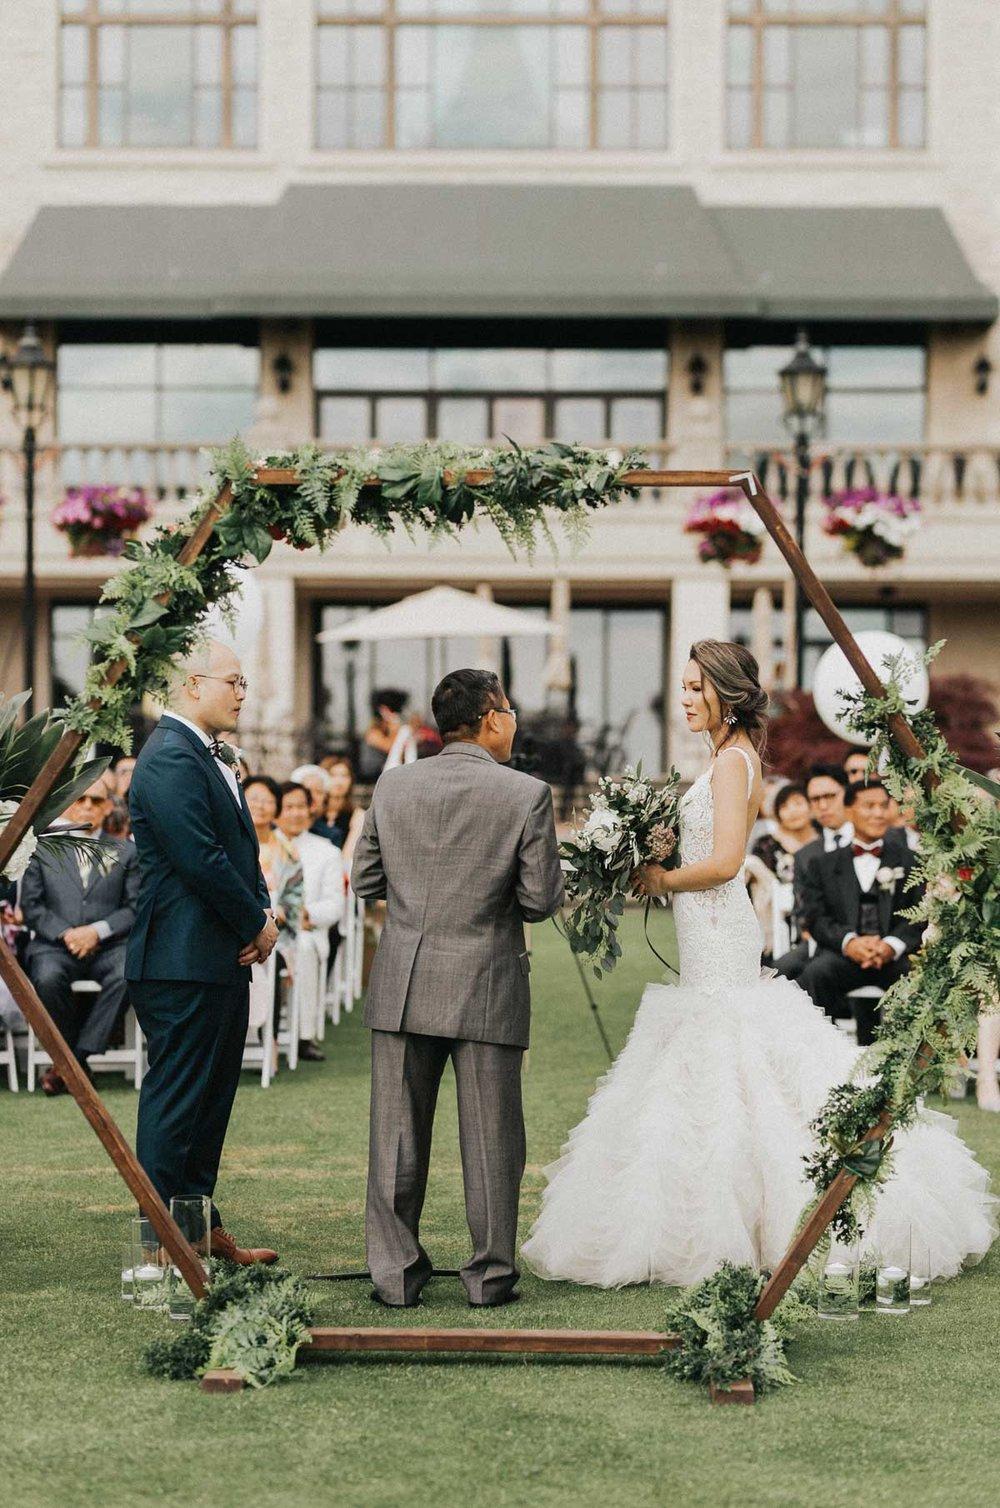 swaneset_flower_arch_wedding_ceremony.jpg